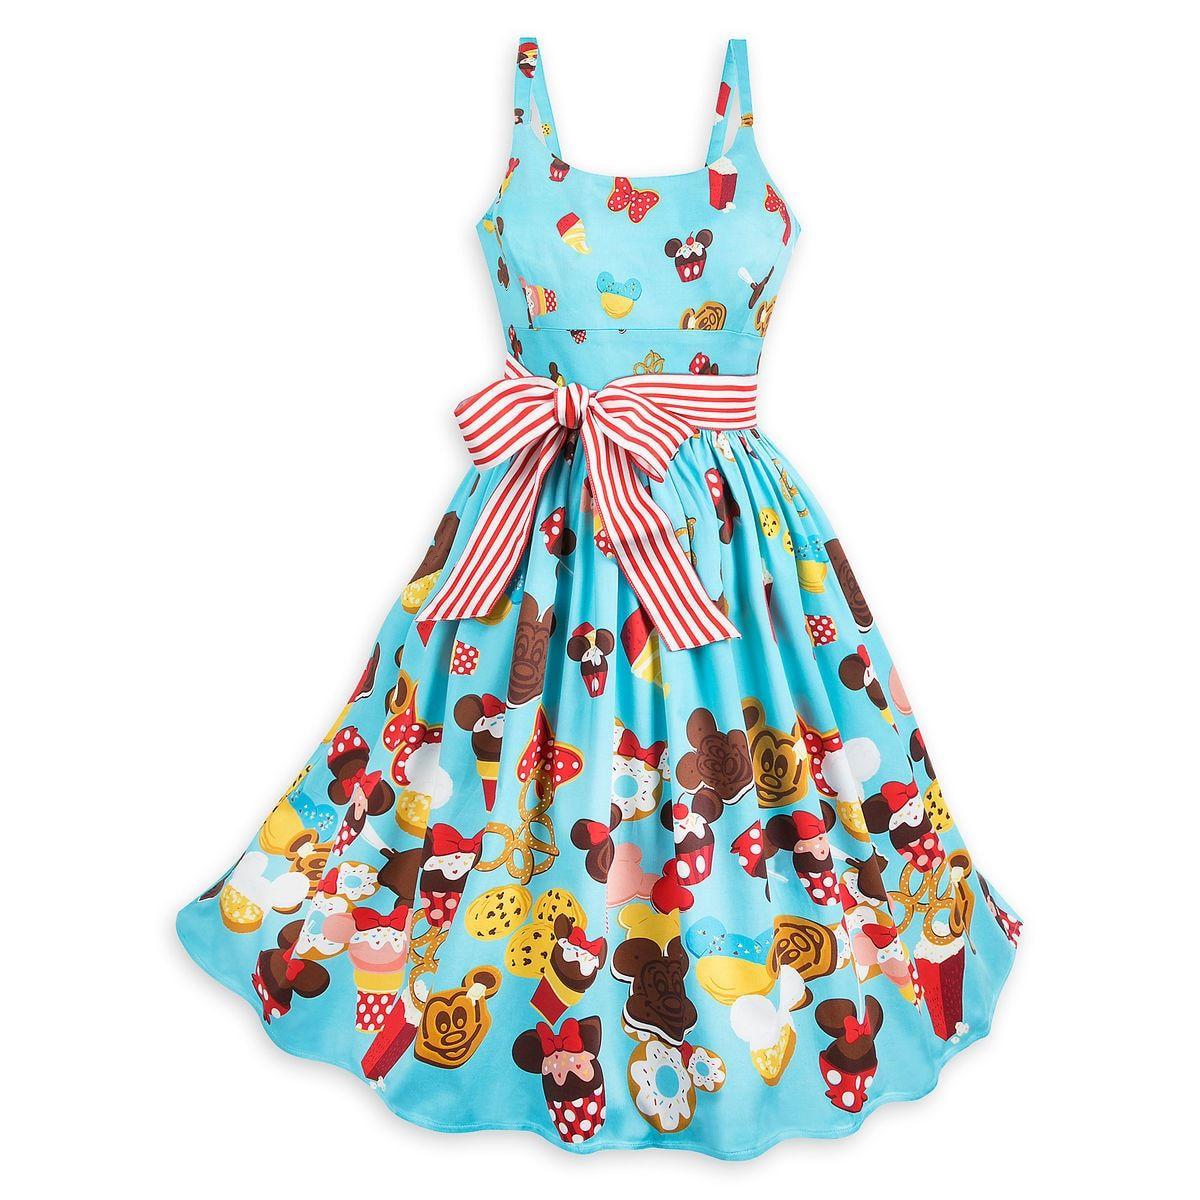 Disney Parks Food Icons Dress for Women  shopDisney  Disney